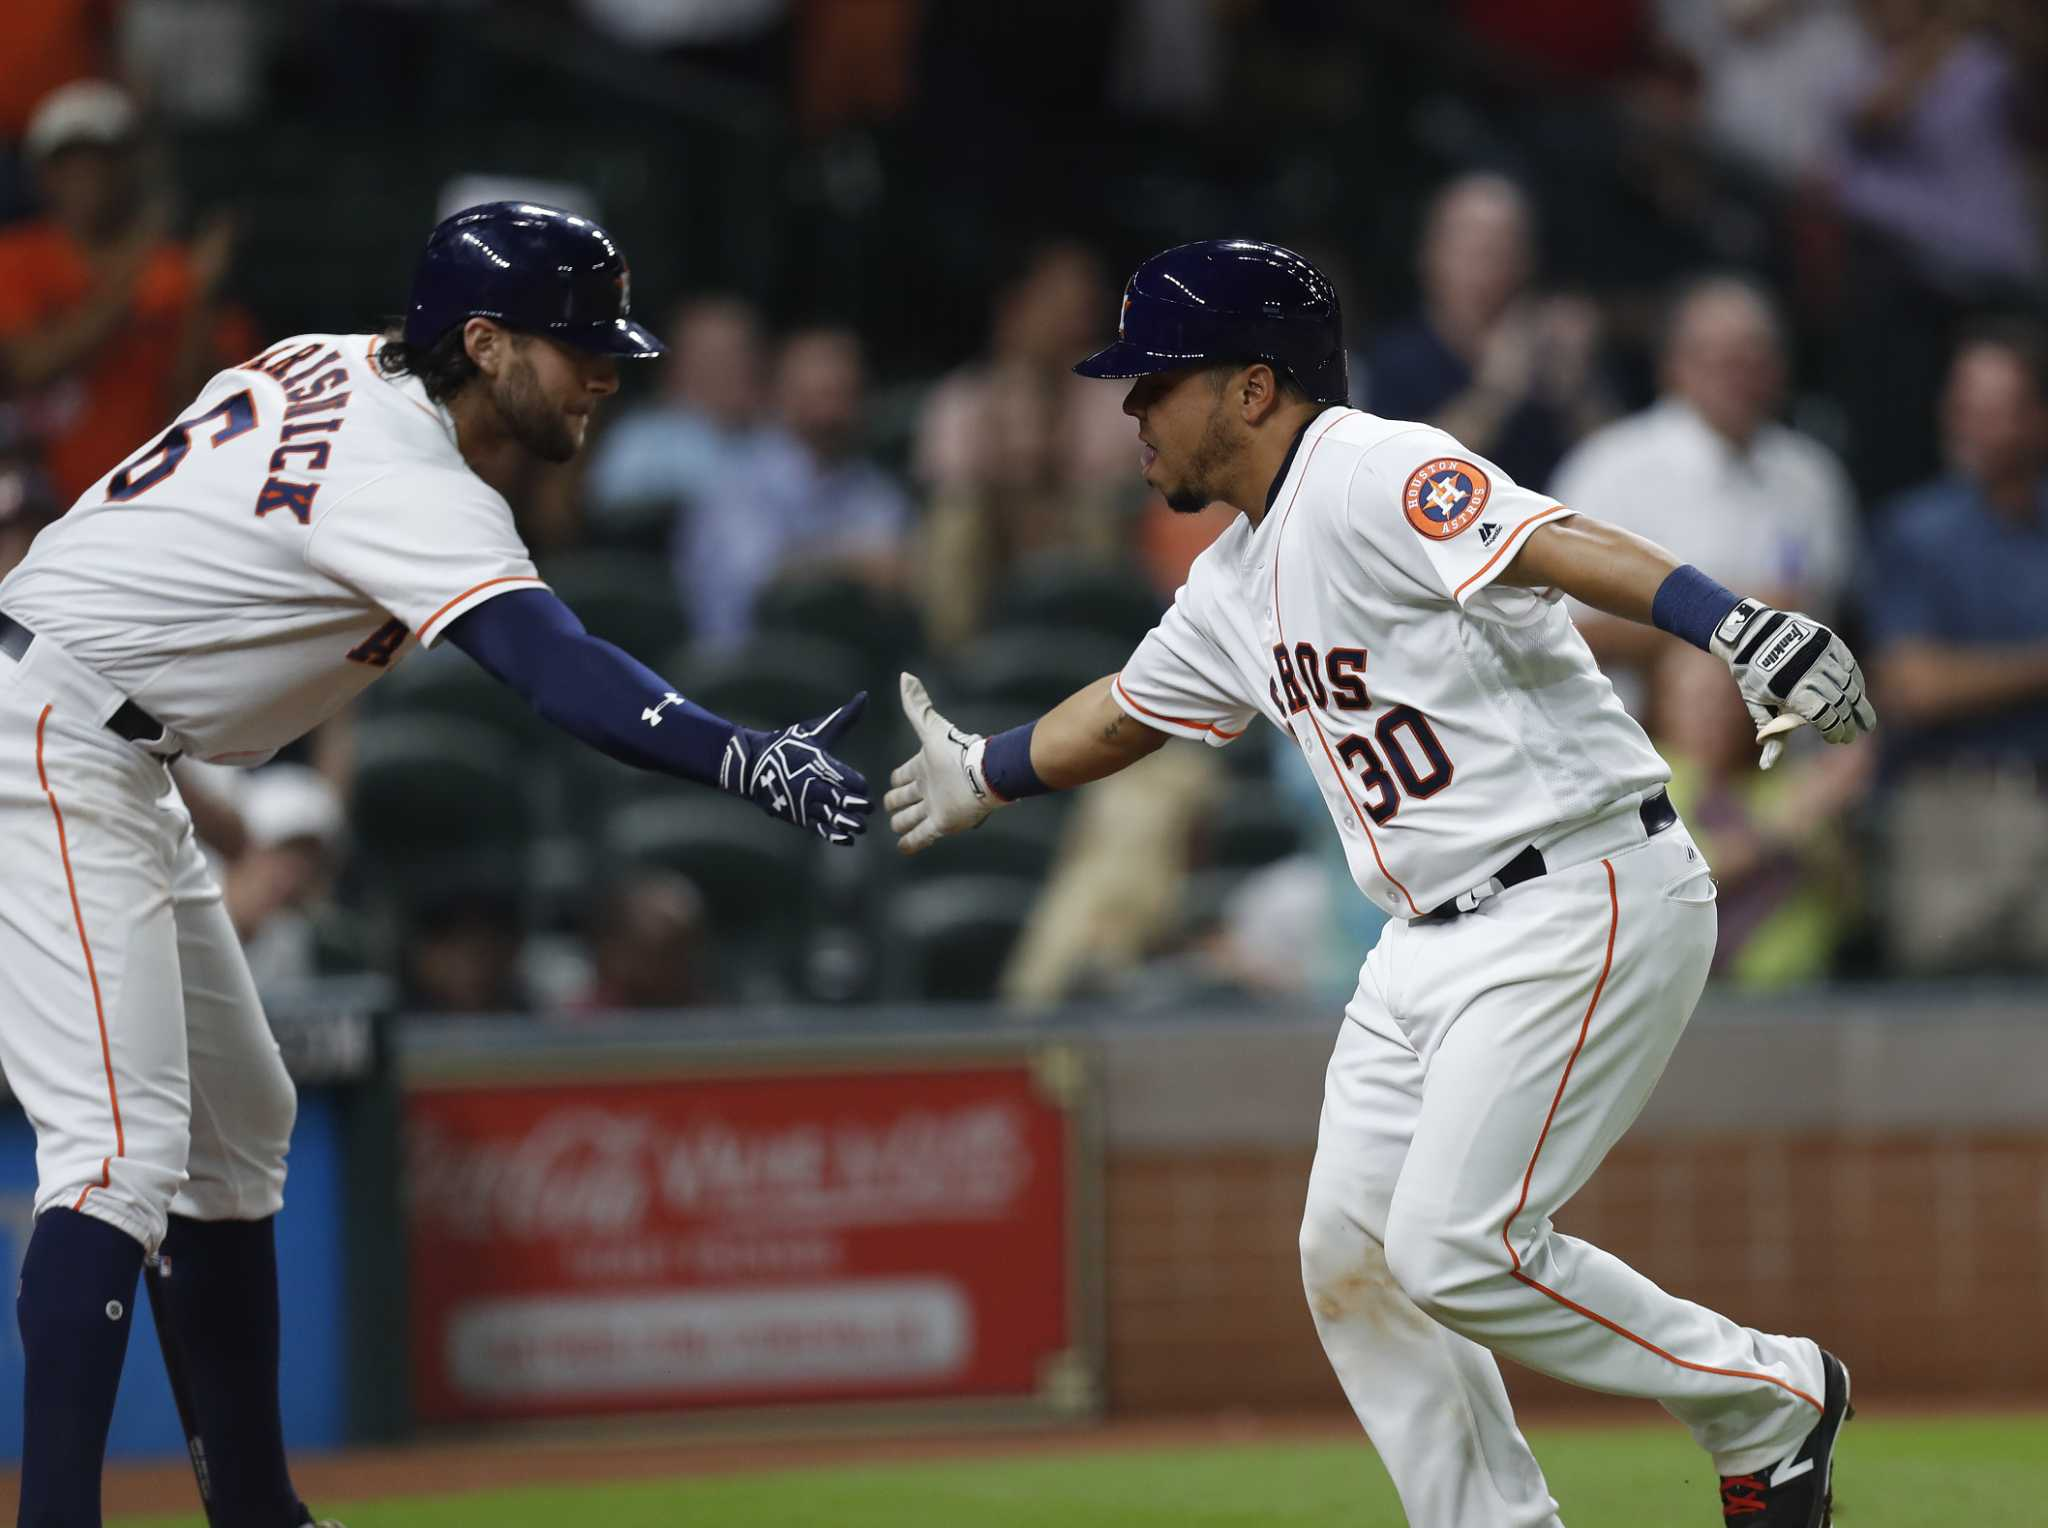 online store ba503 da5de New catcher Juan Centeno makes impact in Astros' 6-2 win ...